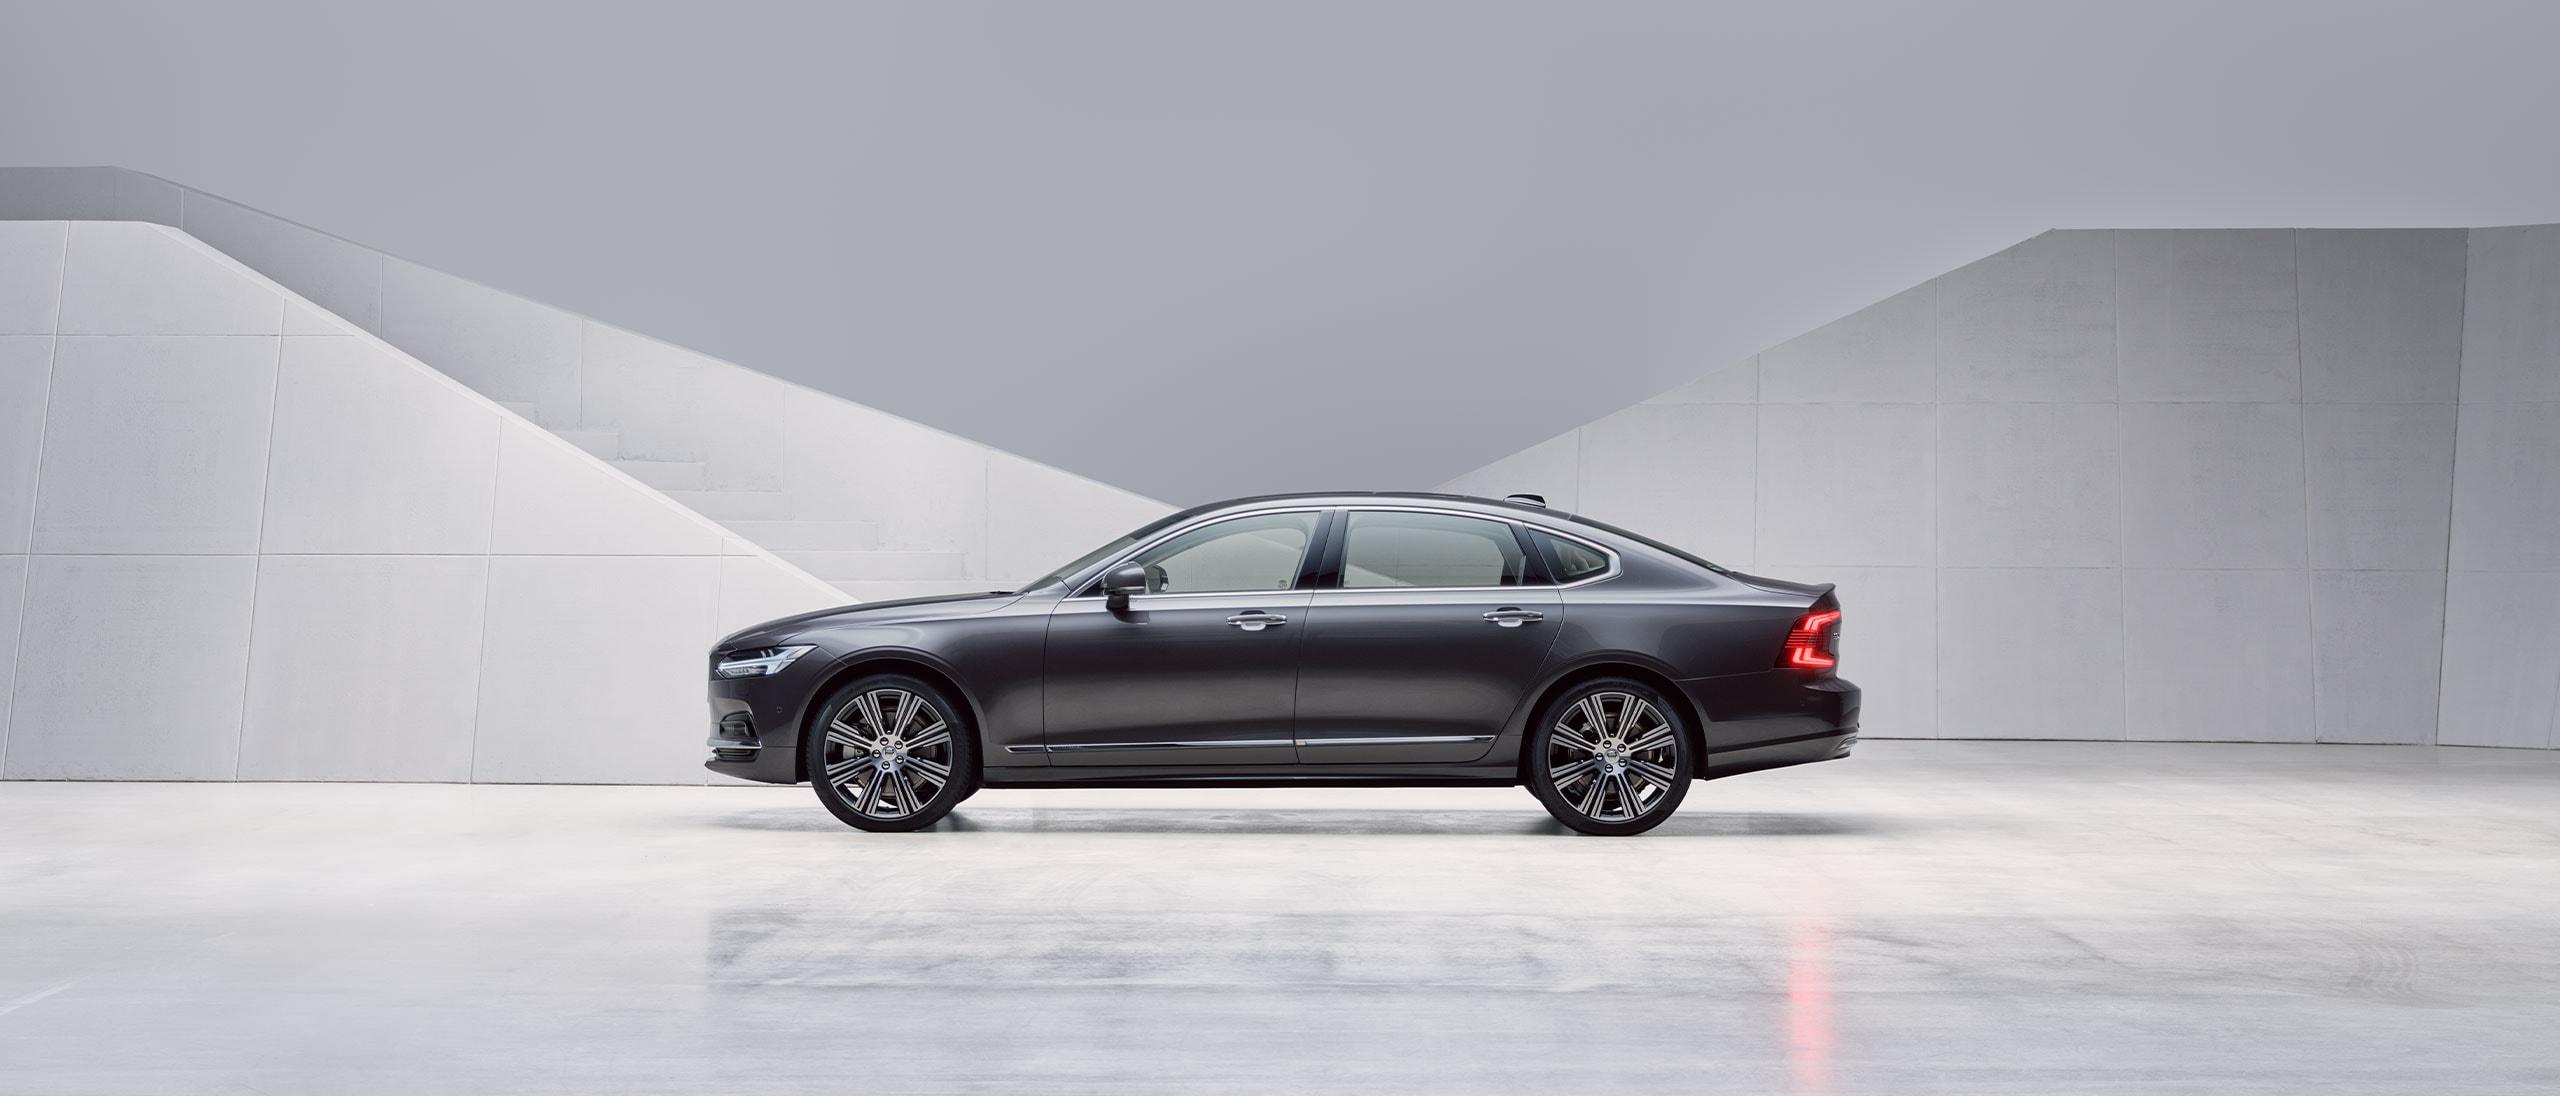 Tamni Volvo S90 parkiran ispred sivog zida.